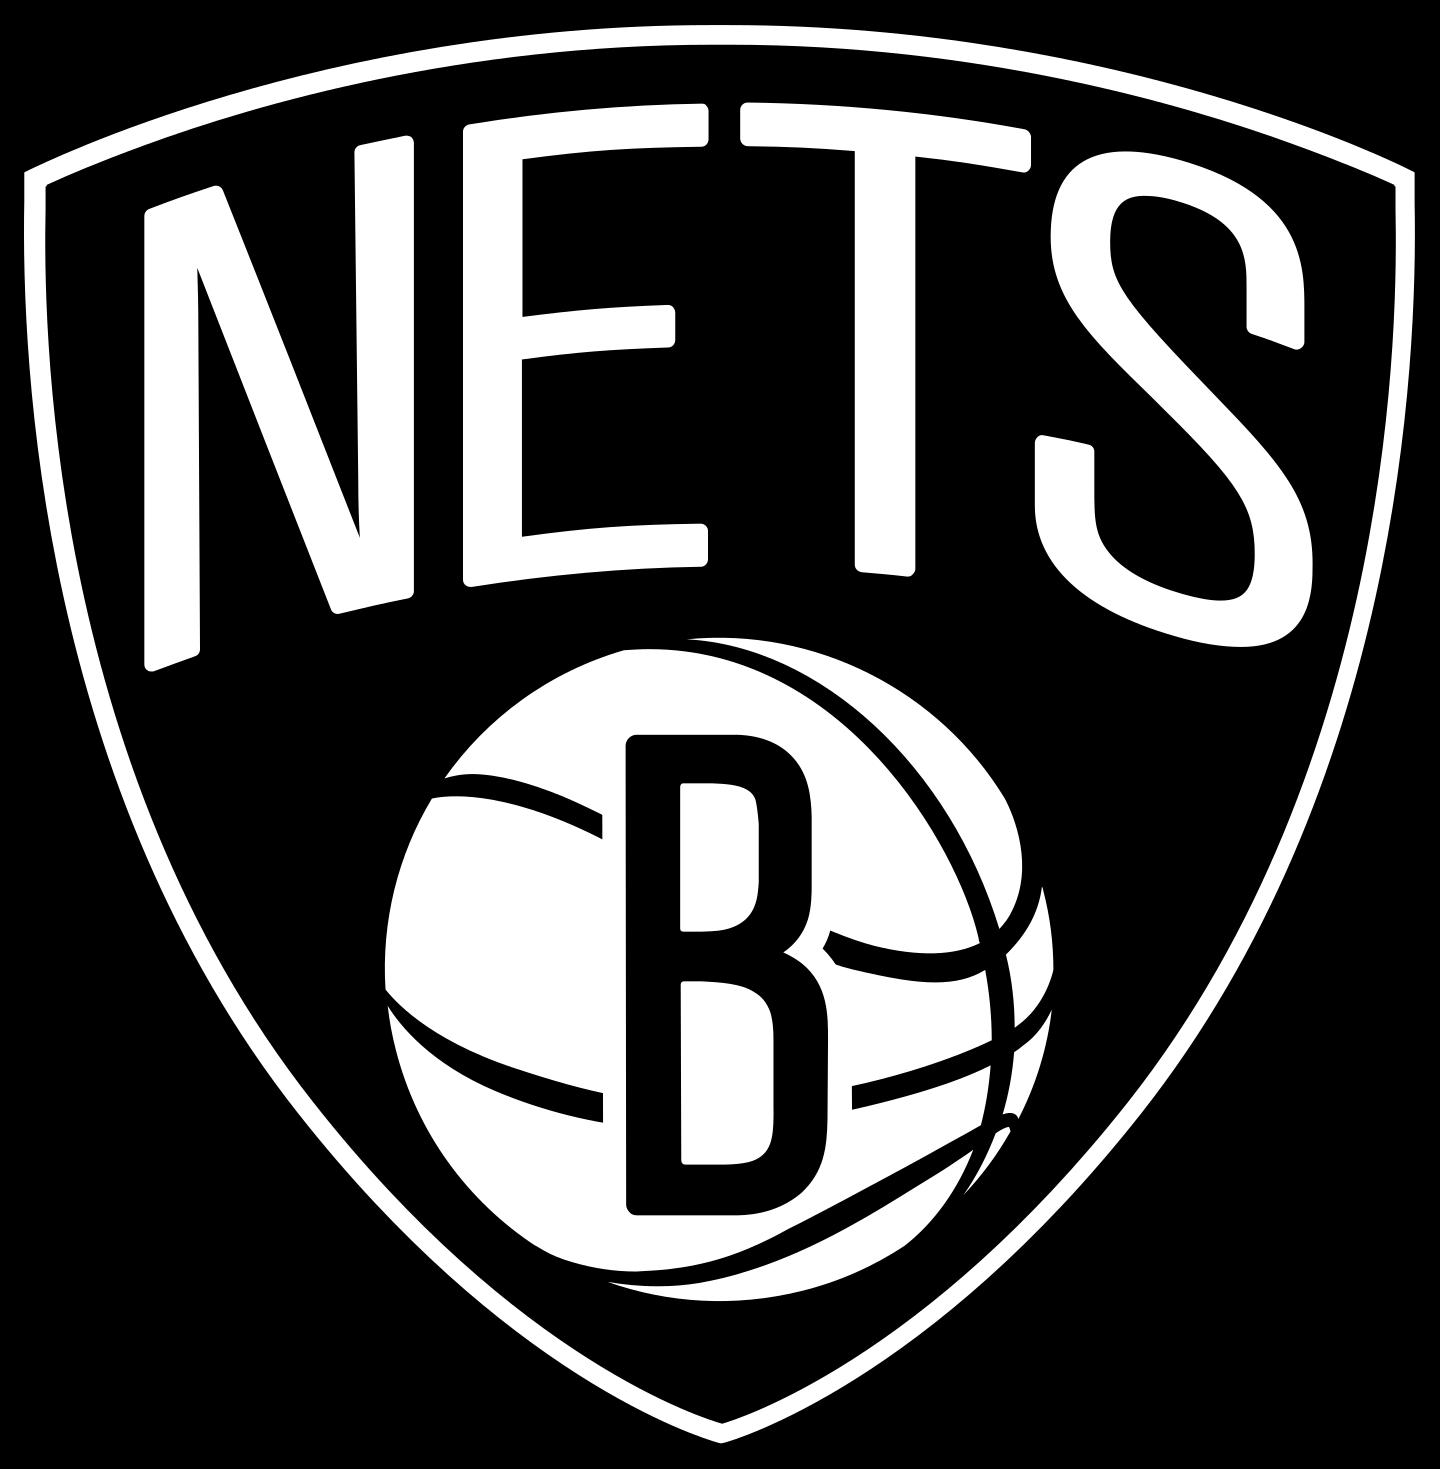 brooklyn nets logo 4 - Brooklyn Nets Logo